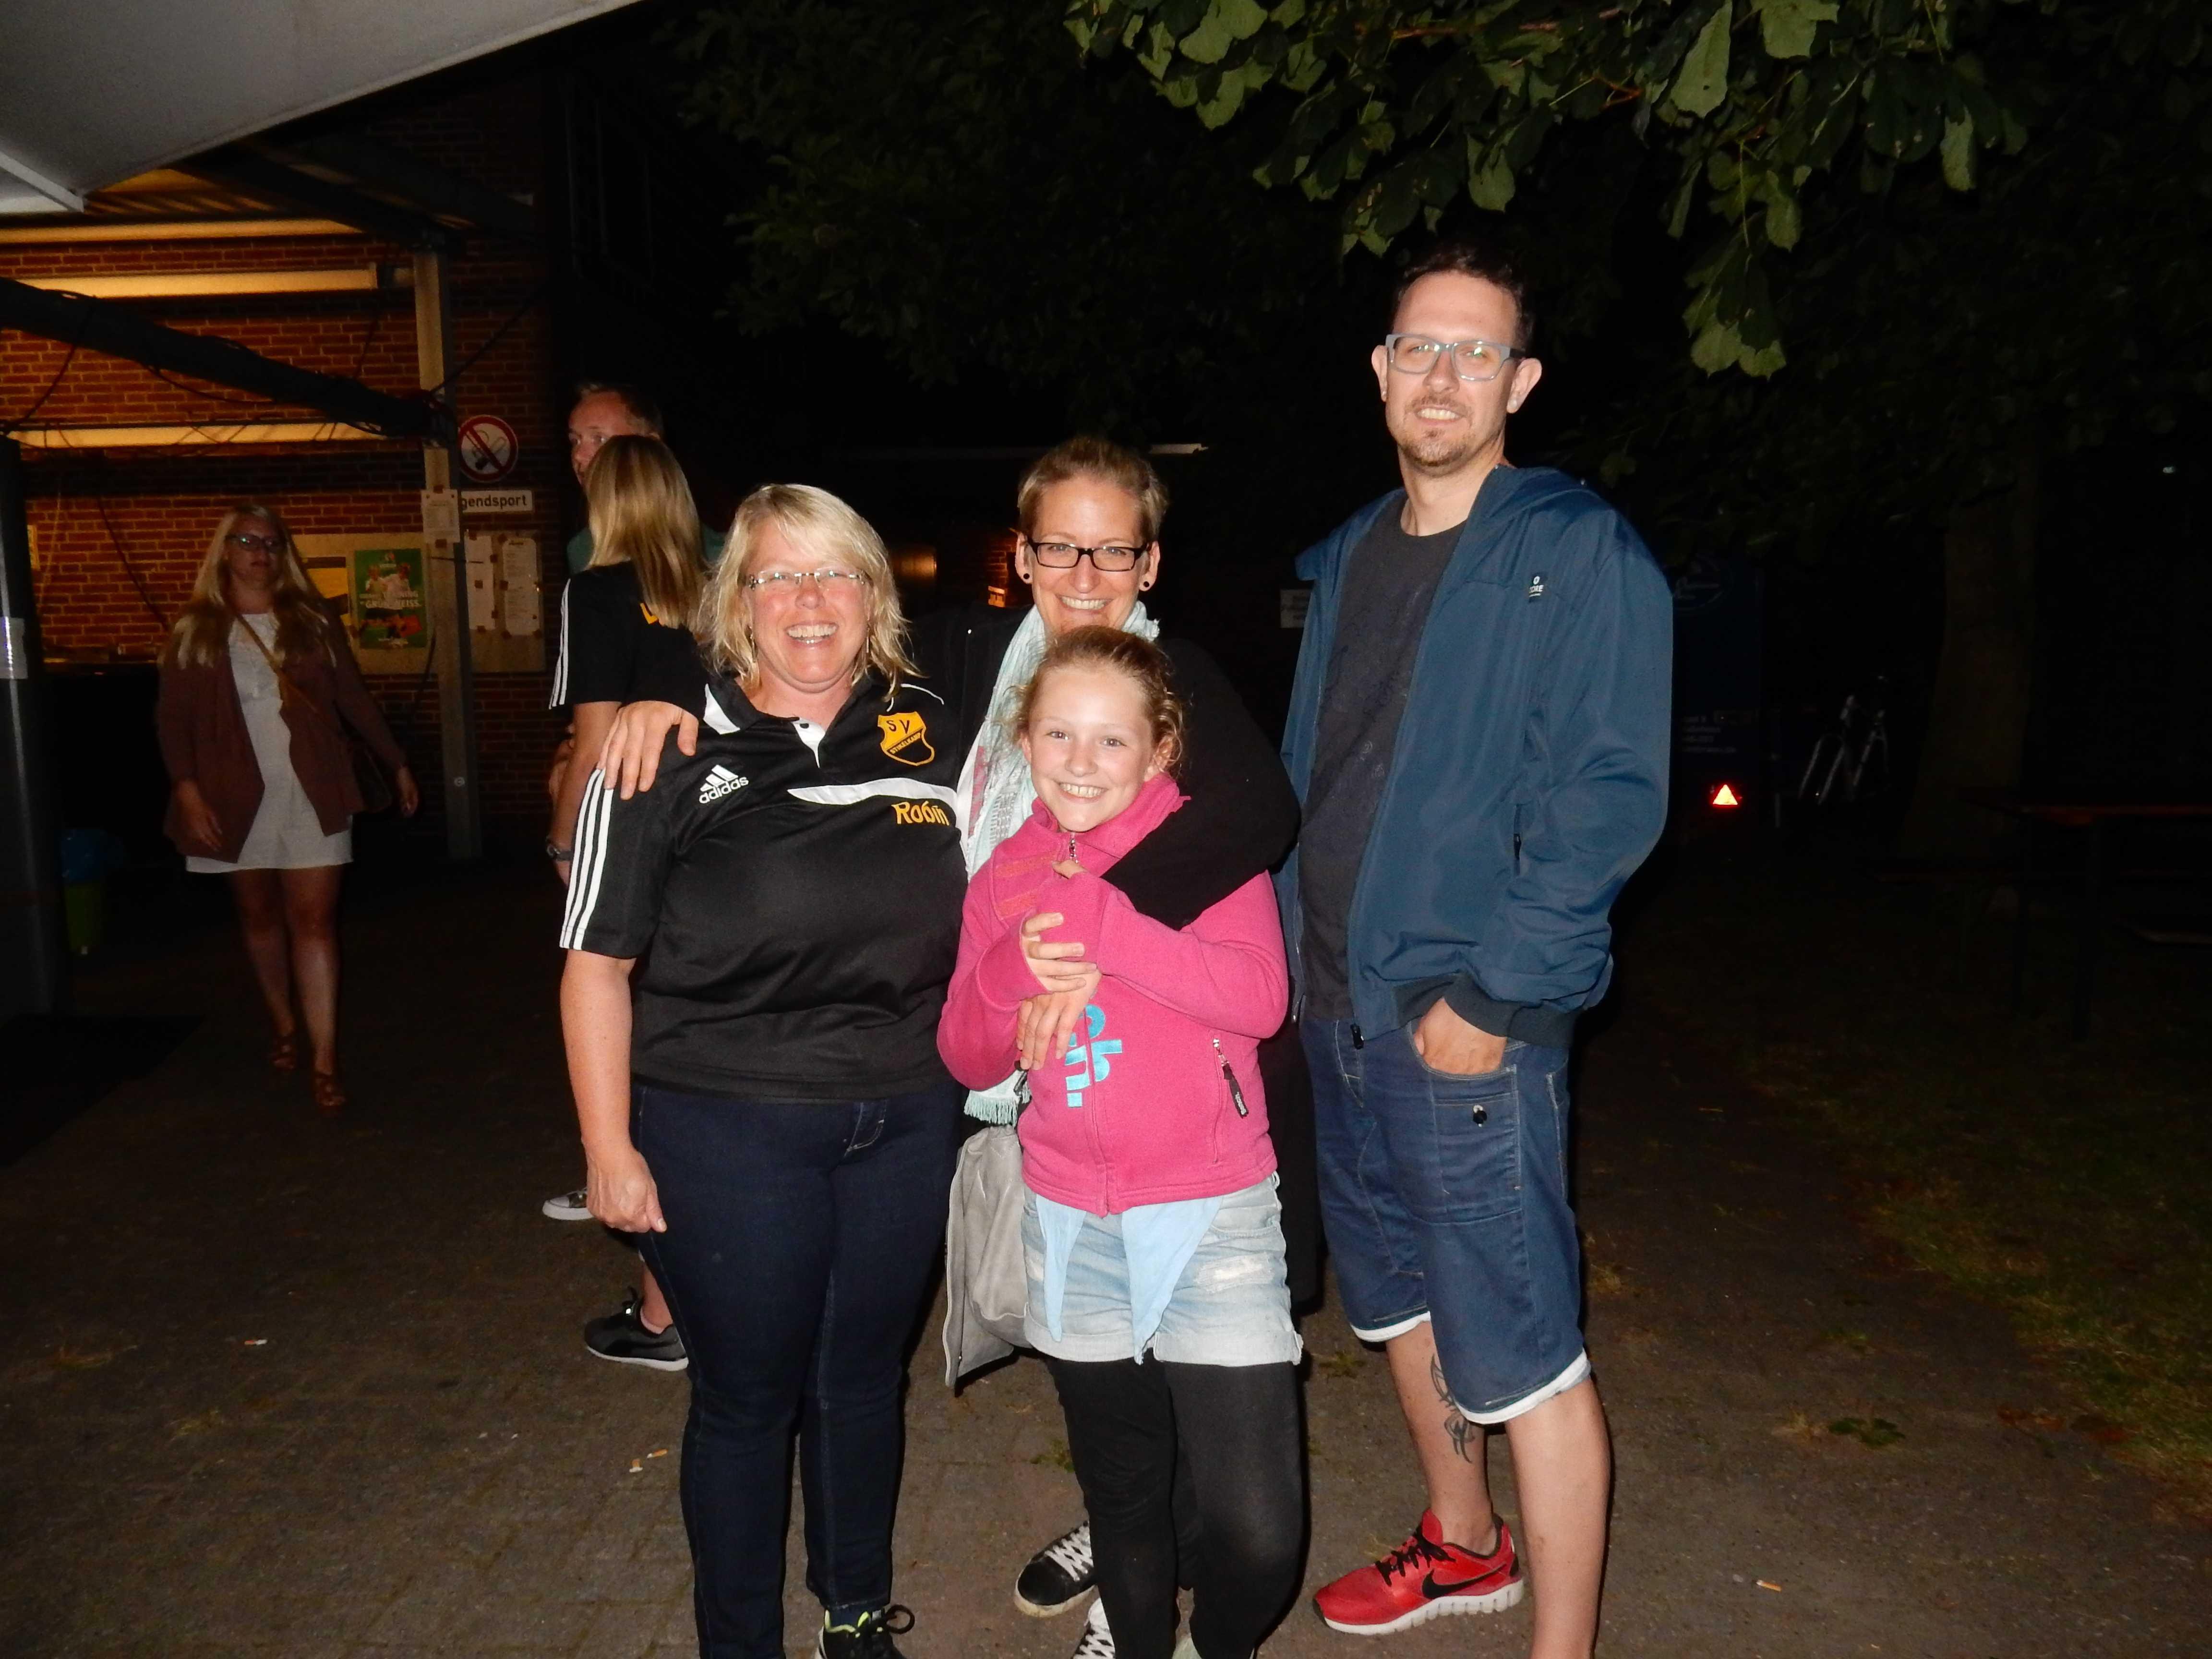 2016-07-28 Sportwoche - erster Donnerstag (60)